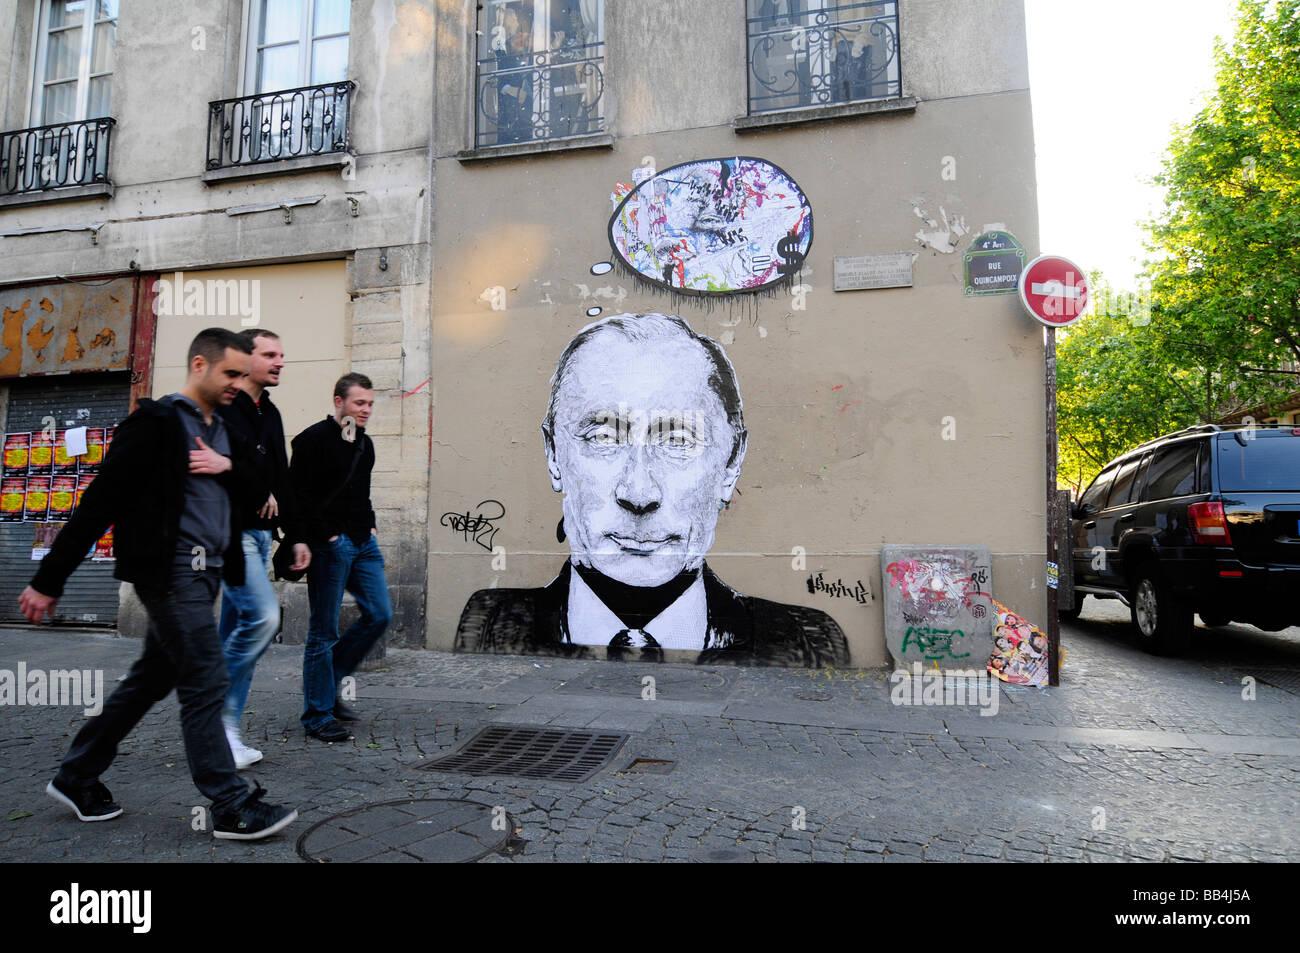 A graffiti representing Russian leader Vladimir Putin on the walls of Paris, France. - Stock Image